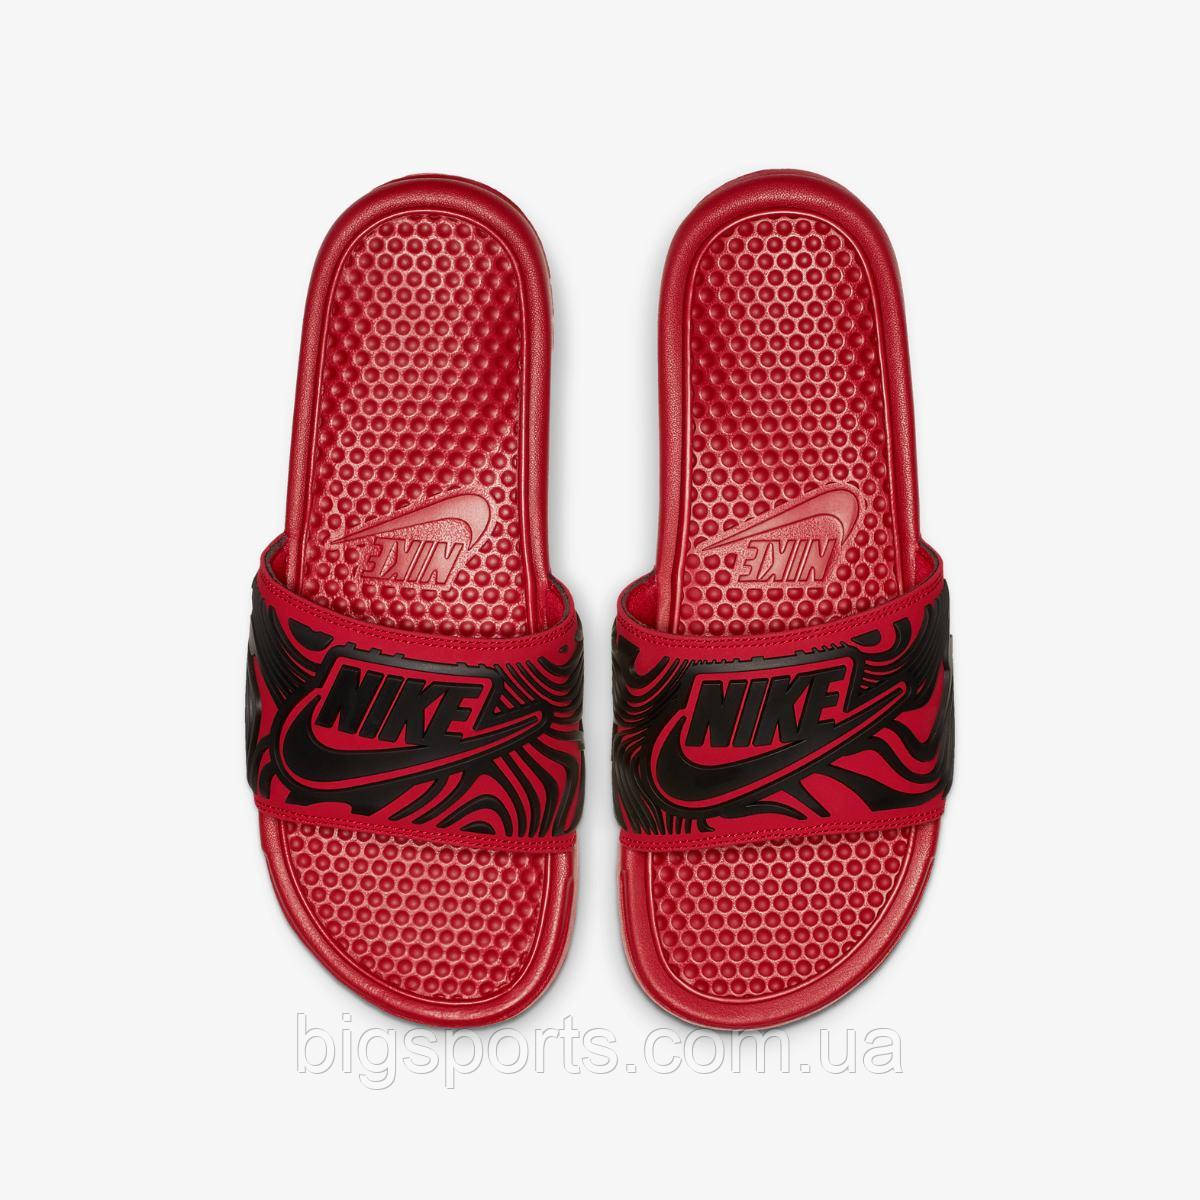 80ee2929 Тапки муж. Nike Benassi Jdi Se (арт. AJ6745-601), цена 750 грн ...